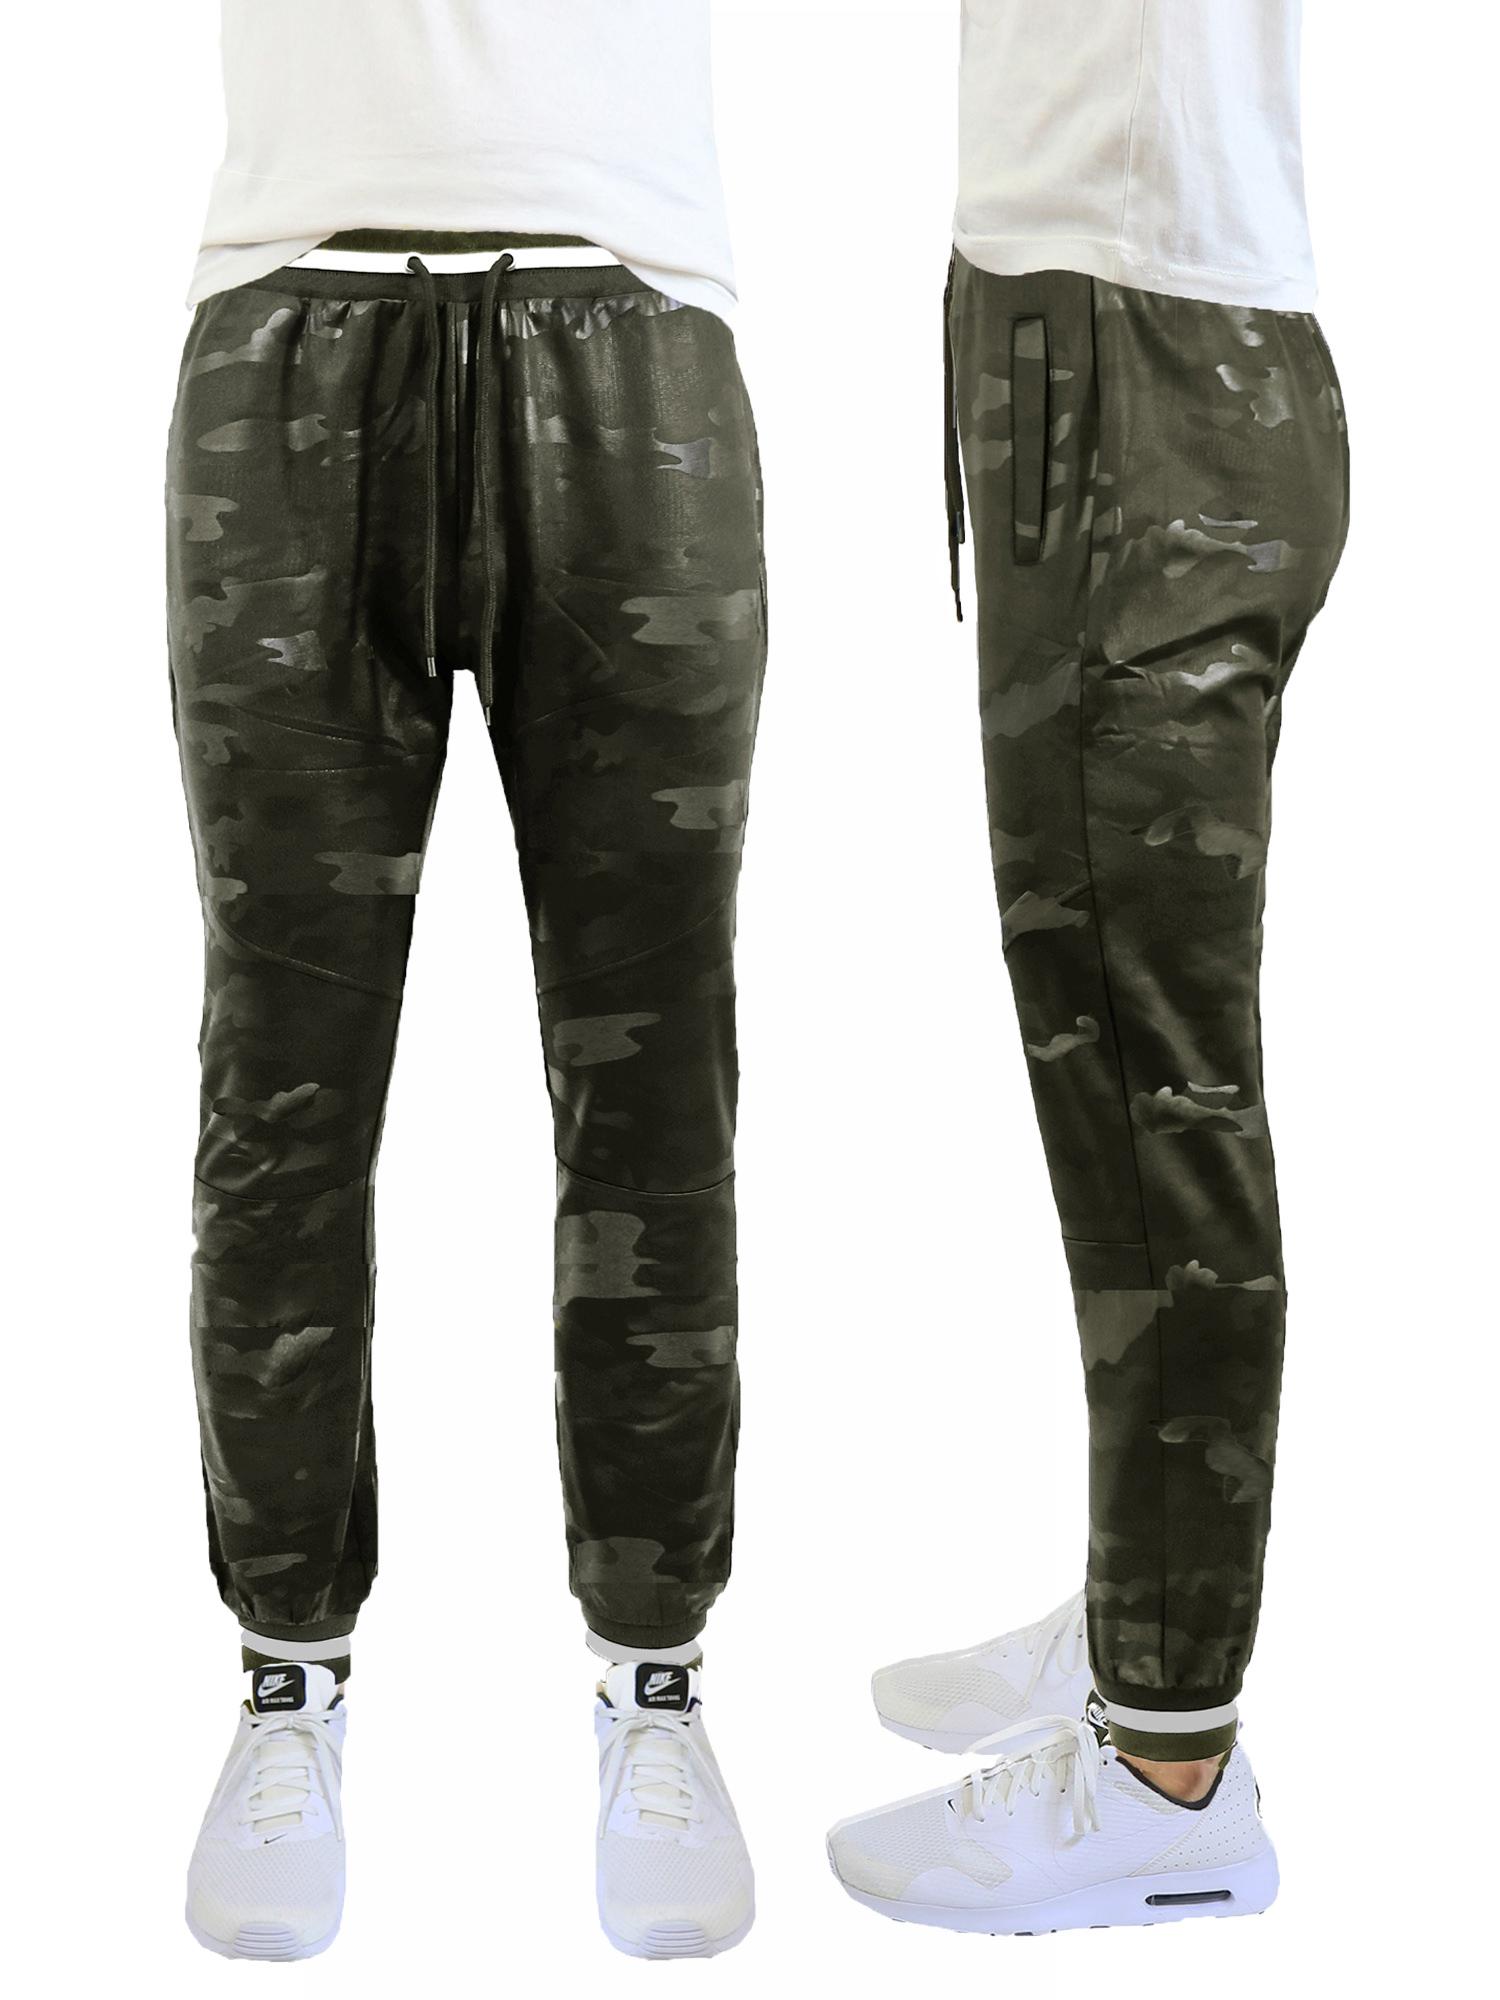 Men's Slim-Fit Camouflage Tech Stretch Jogger Pants